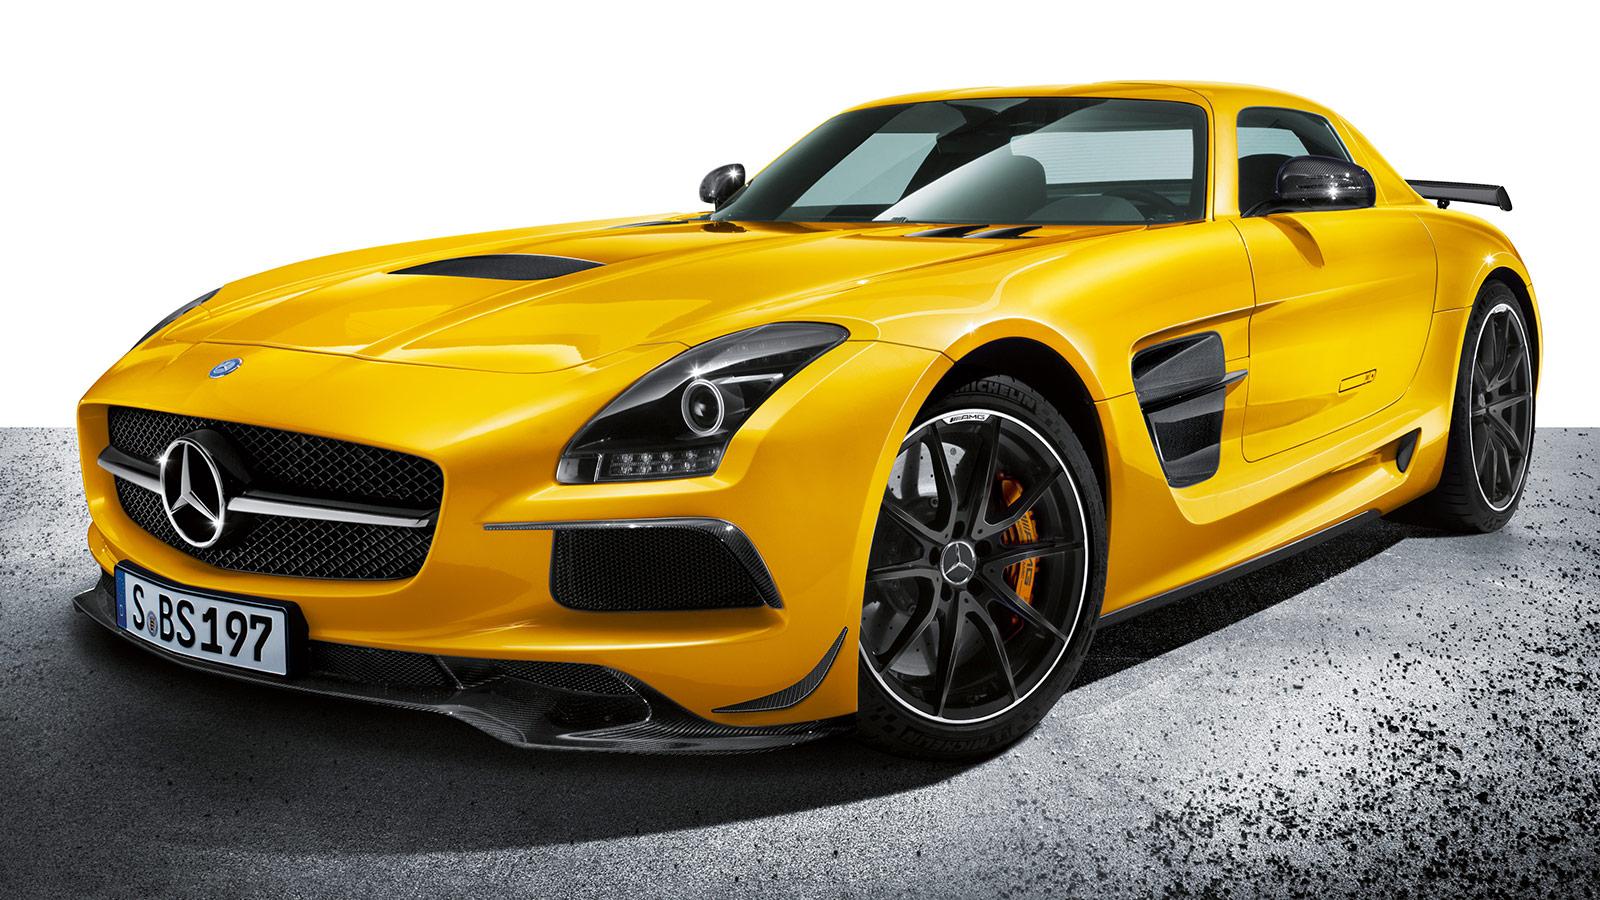 New nomenclature for Mercedes-Benz models & engines